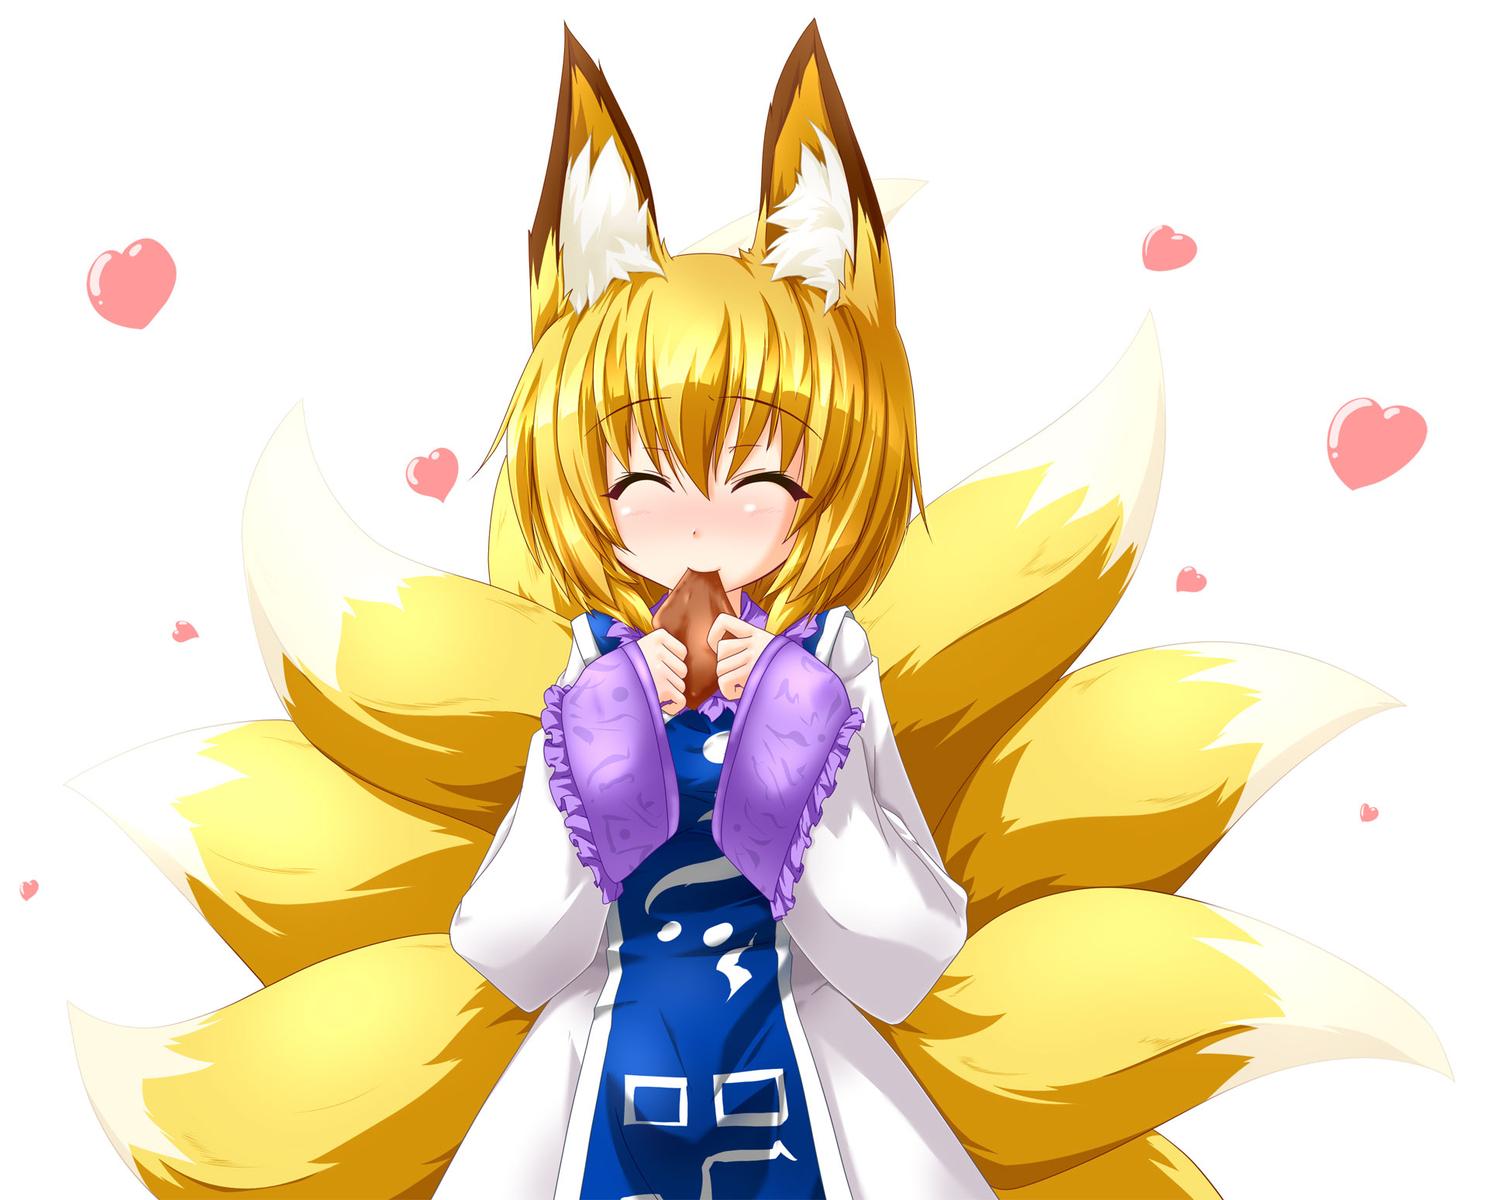 animal_ears blonde_hair blush food foxgirl kazami_karasu multiple_tails short_hair tail touhou yakumo_ran